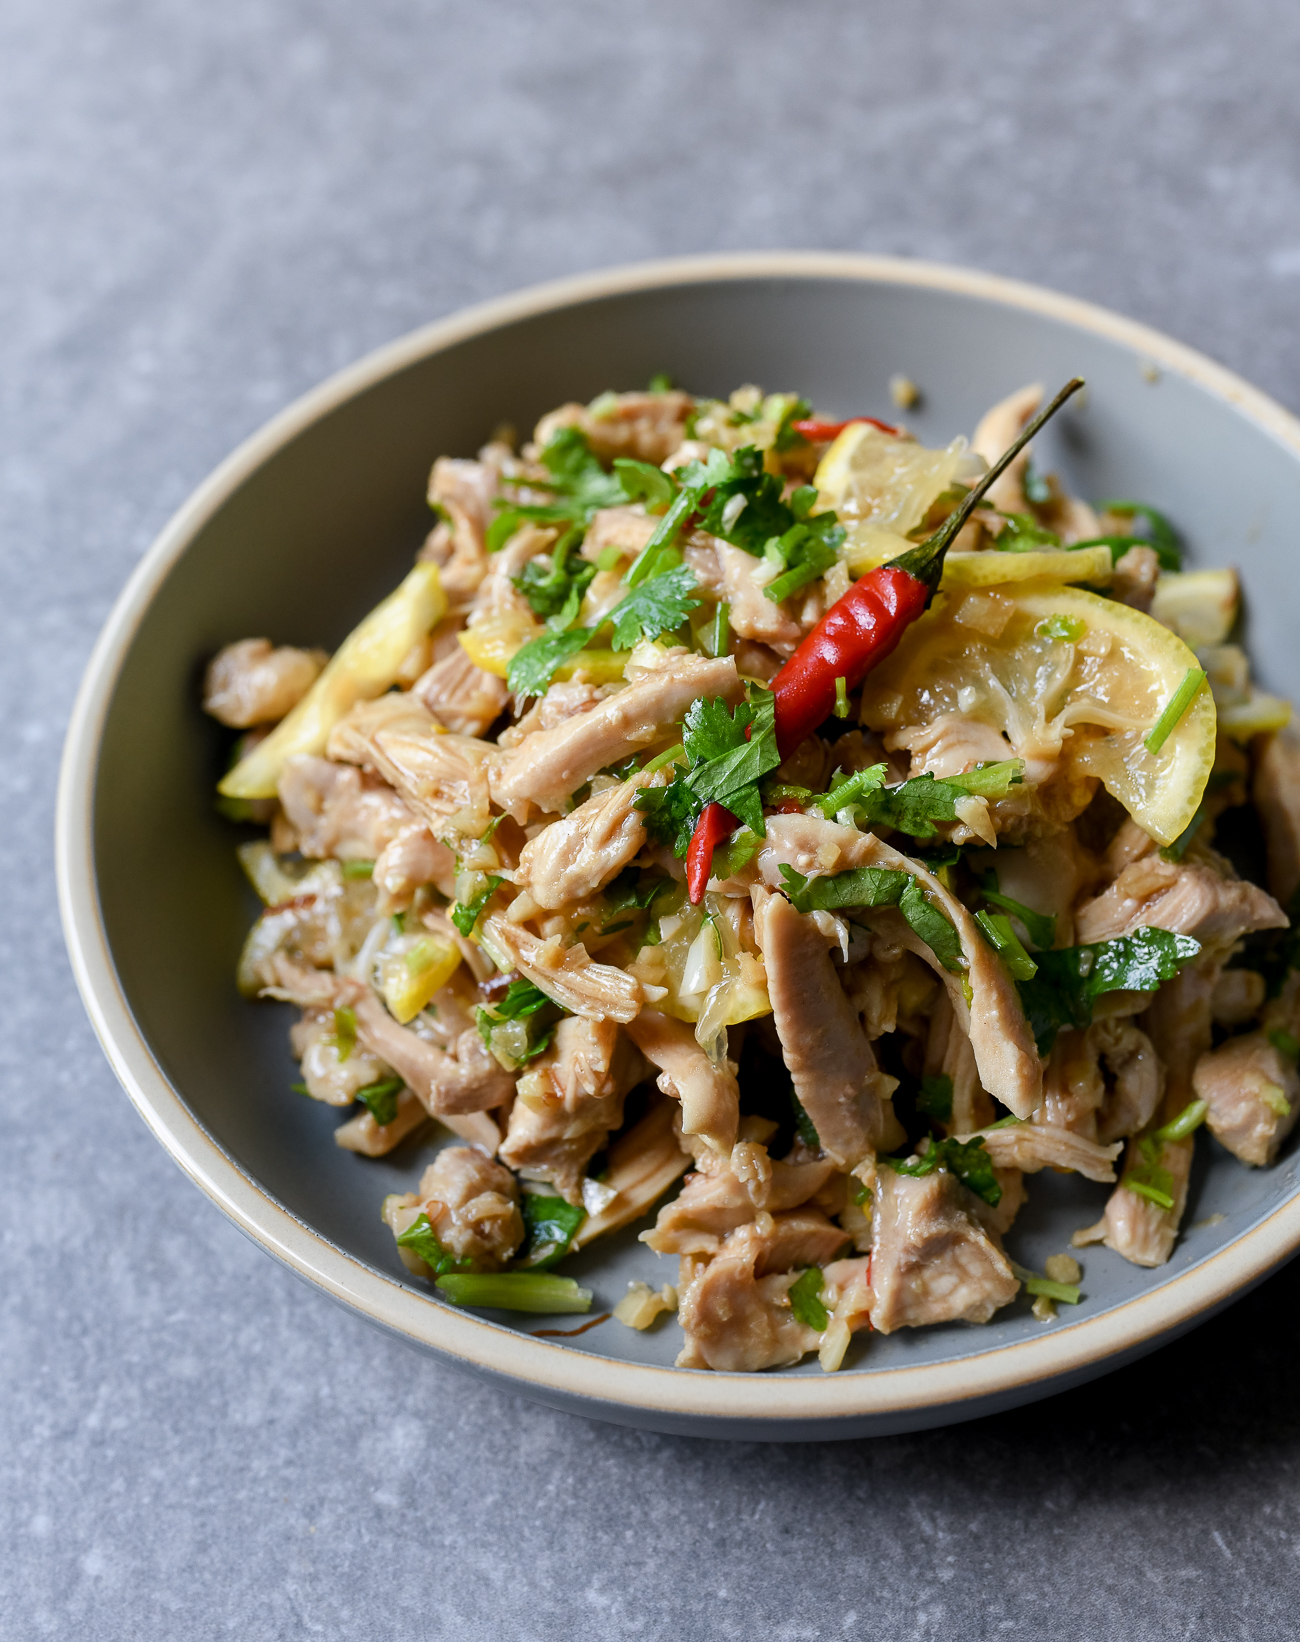 Asian Chicken Salad with Lemon